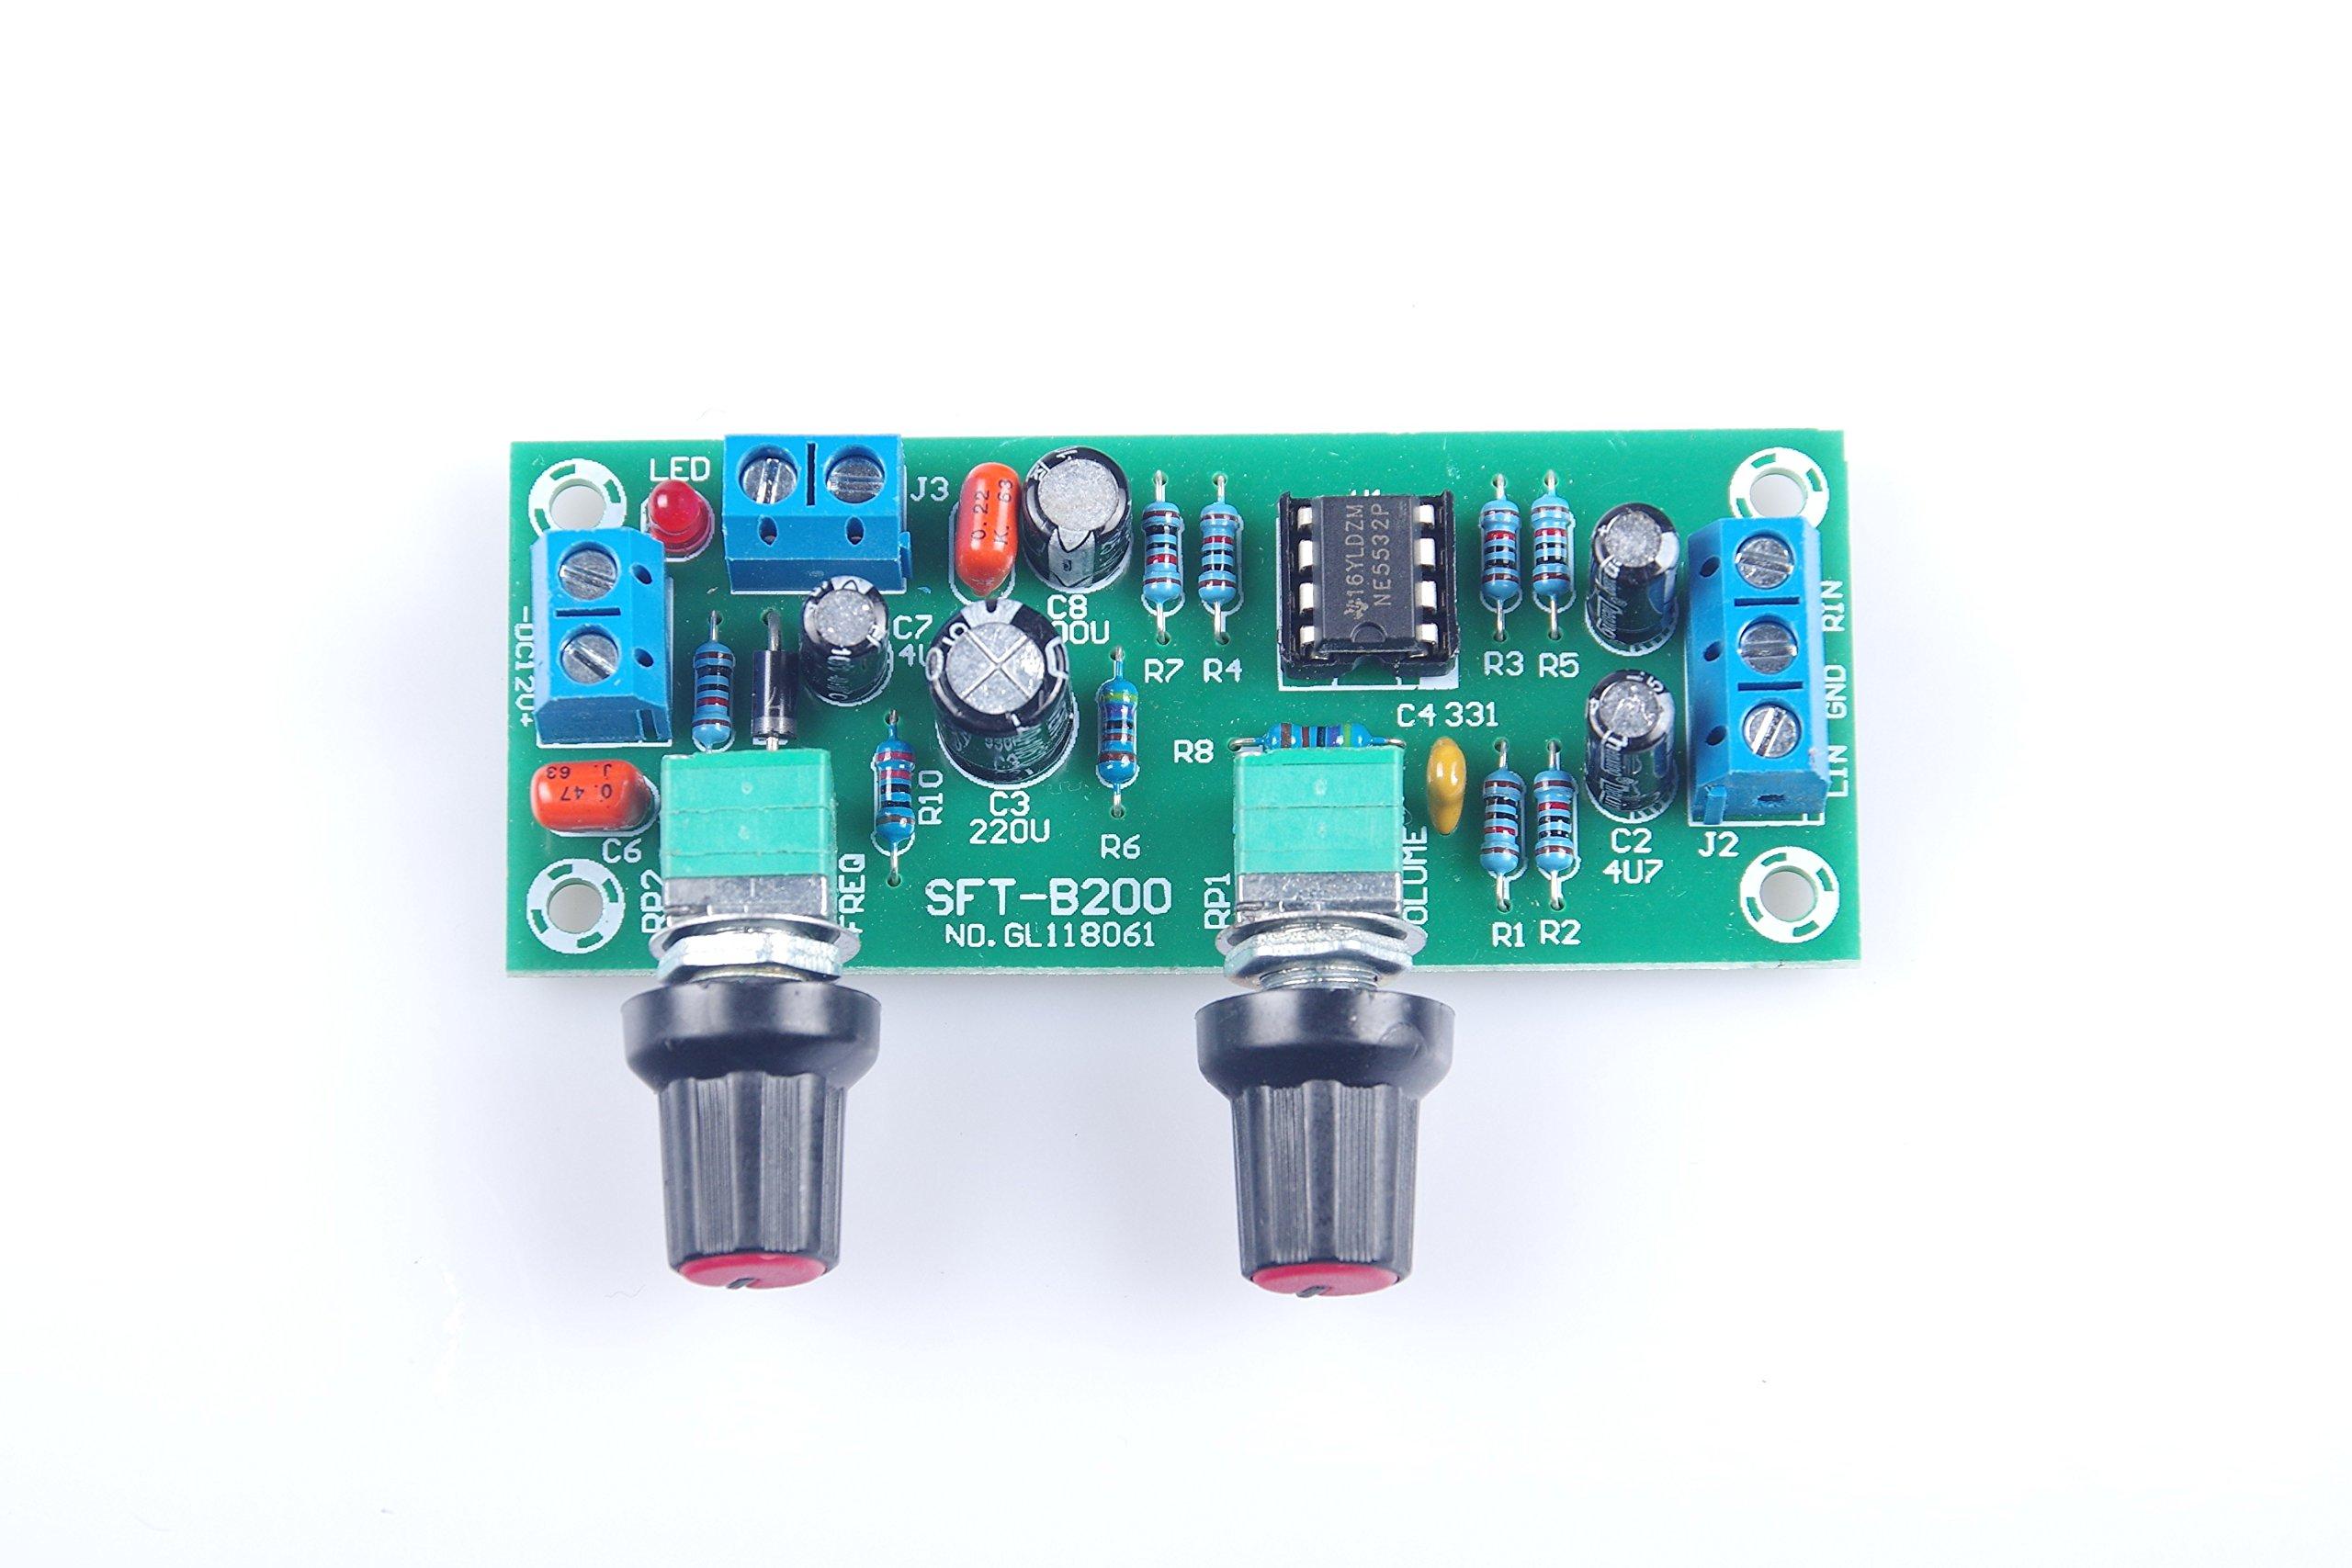 KNACRO DC 10V-24V Low-pass Filter NE5532 Bass Tone Subwoofer Pre-Amplifier Preamp Board